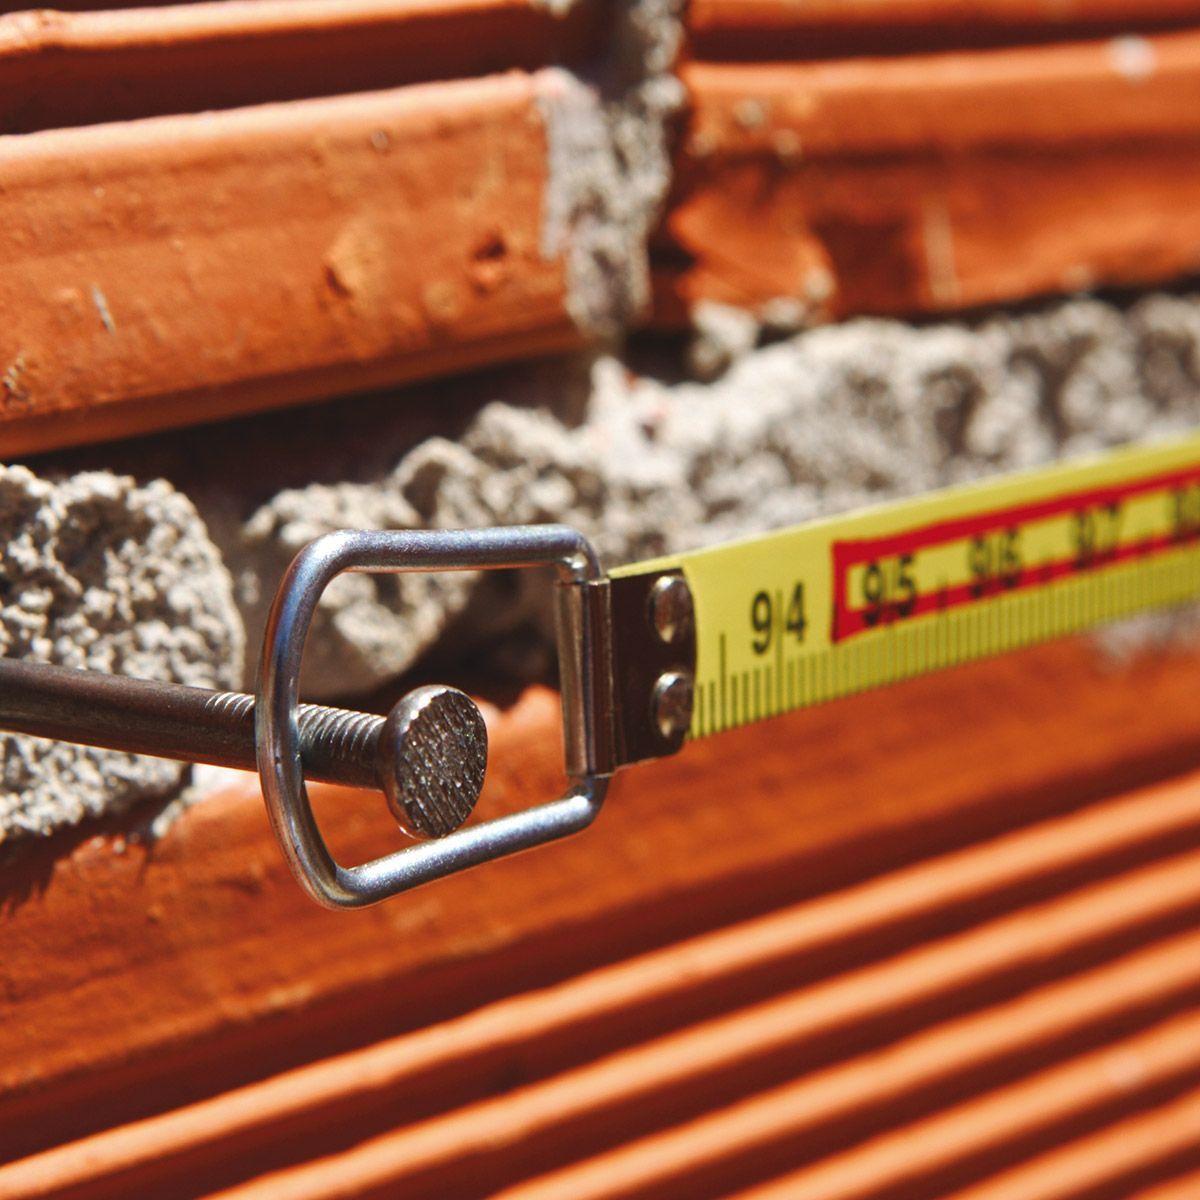 Trena 15m de Aço em Caixa Plástica KTS510-15M Starrett - mm/mm 9420.20010